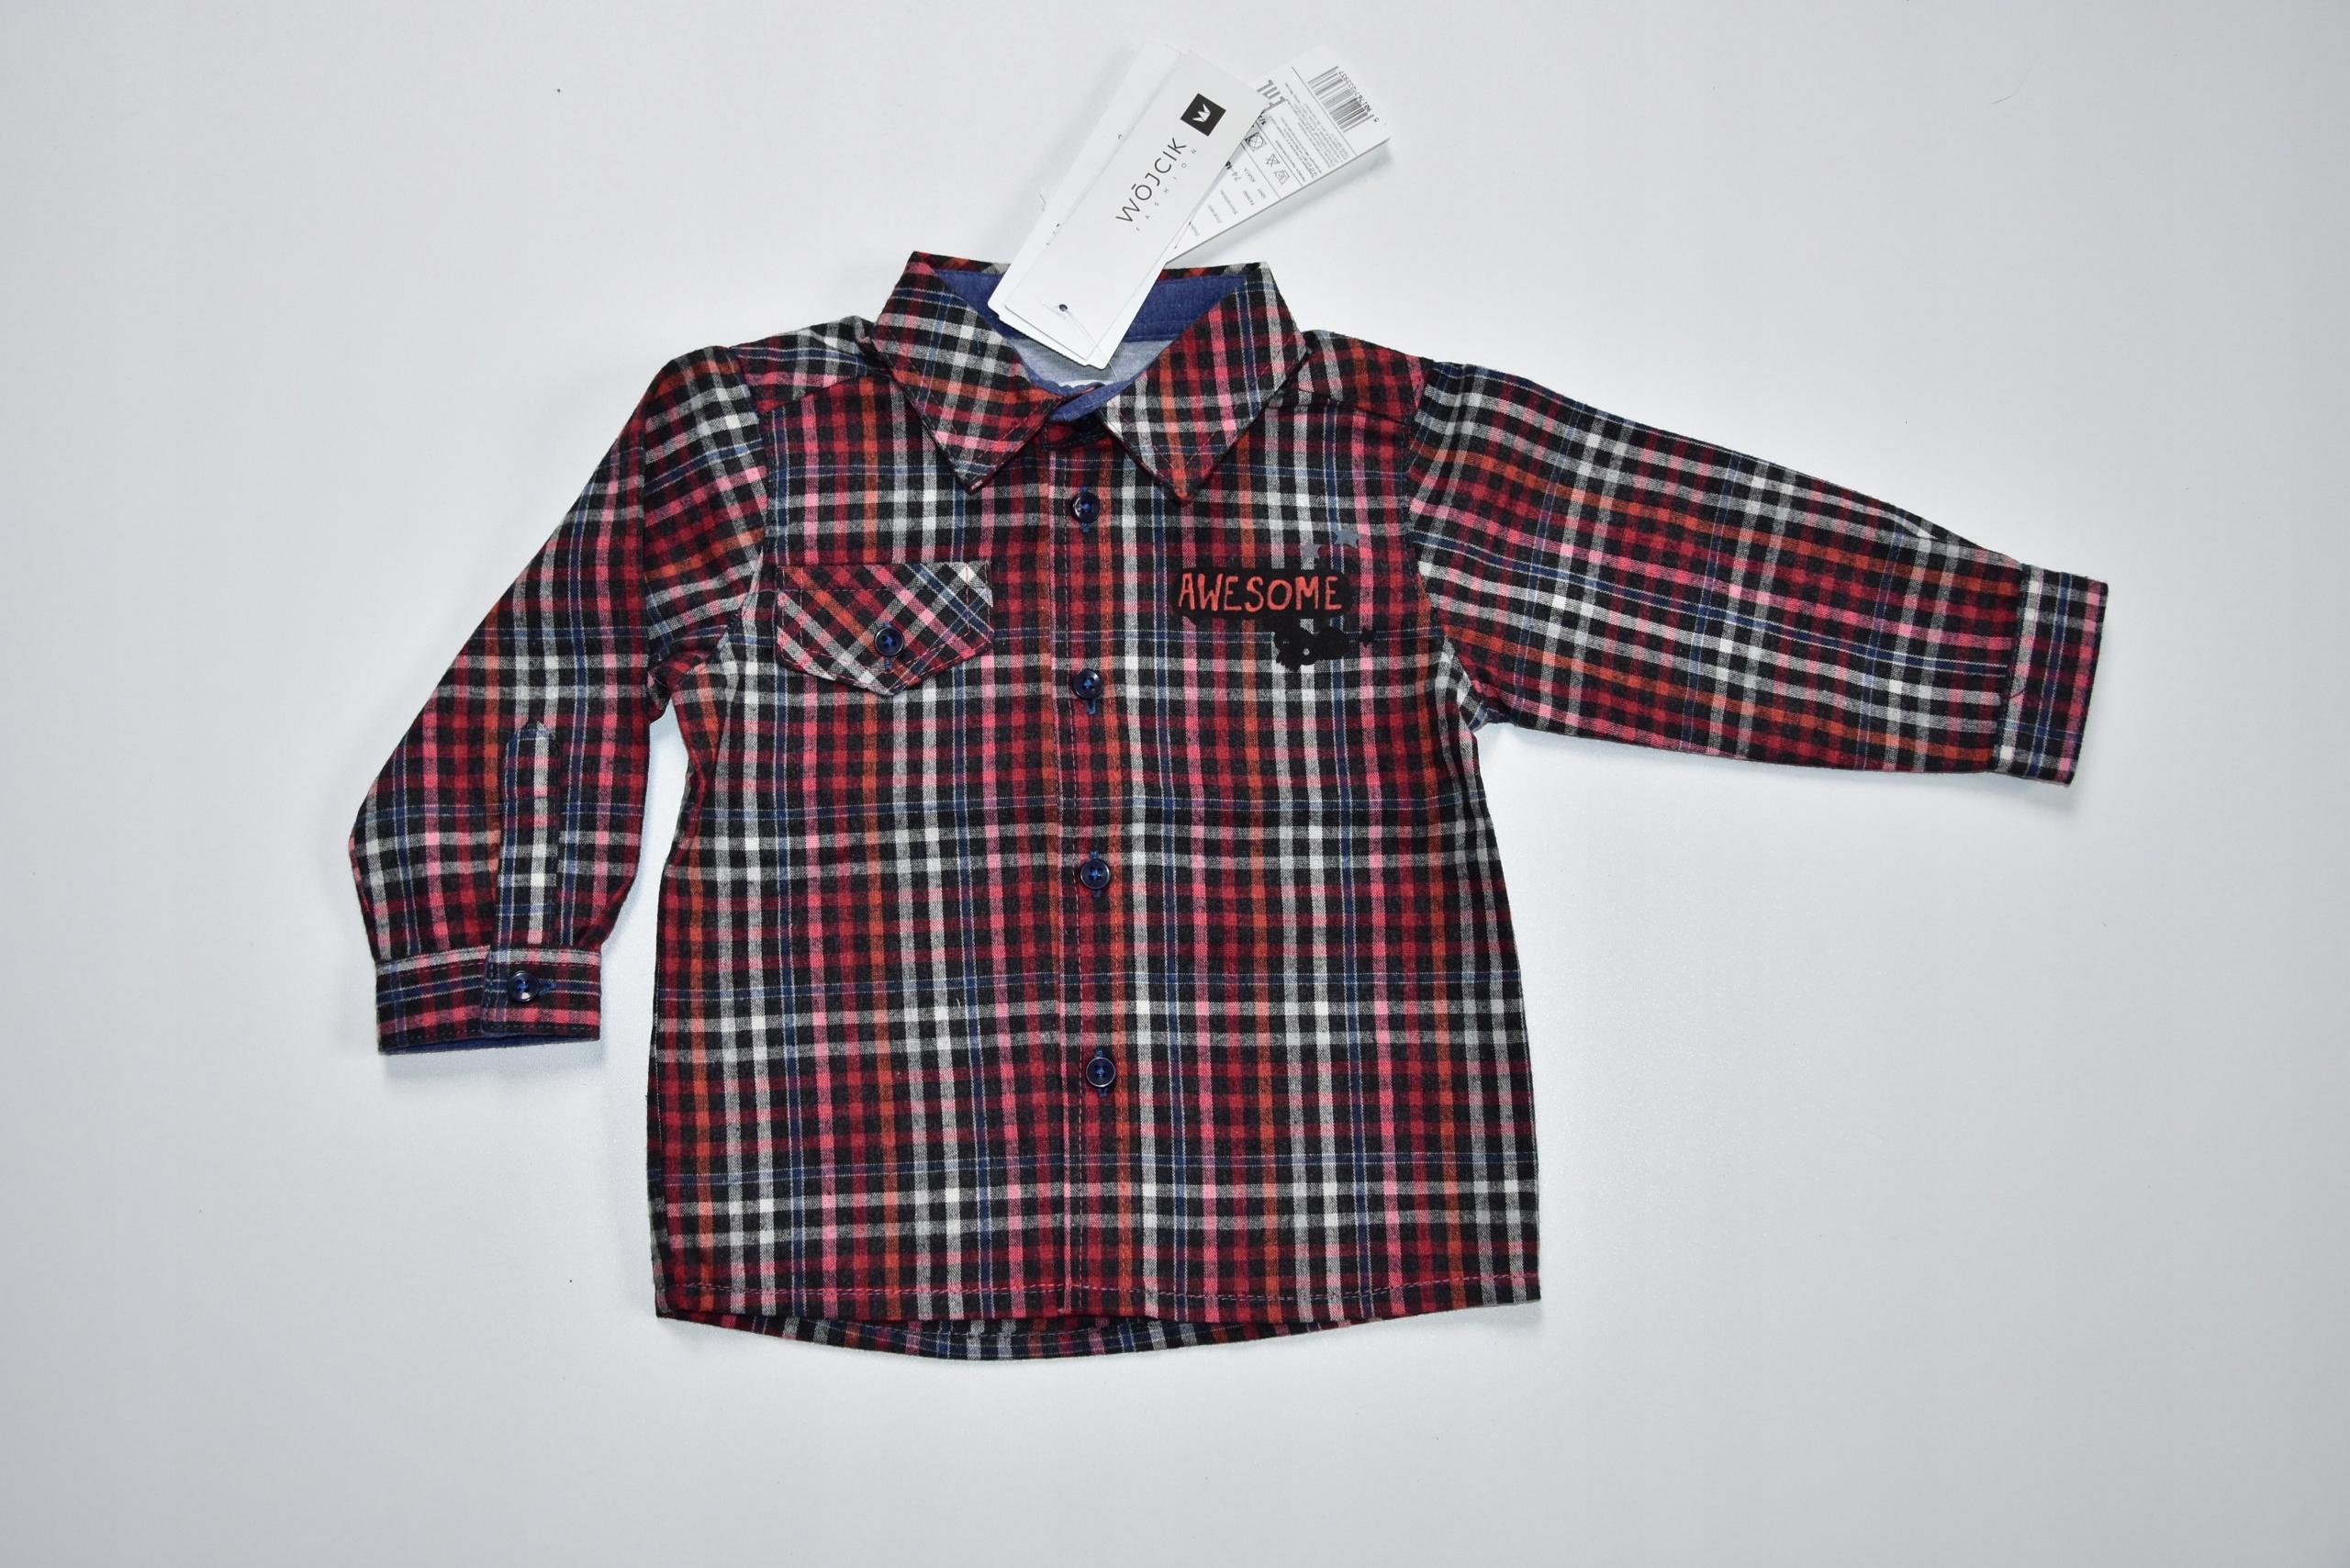 koszula w kratę Wójcik 74 8118314604 Allegro.pl  LDTZi